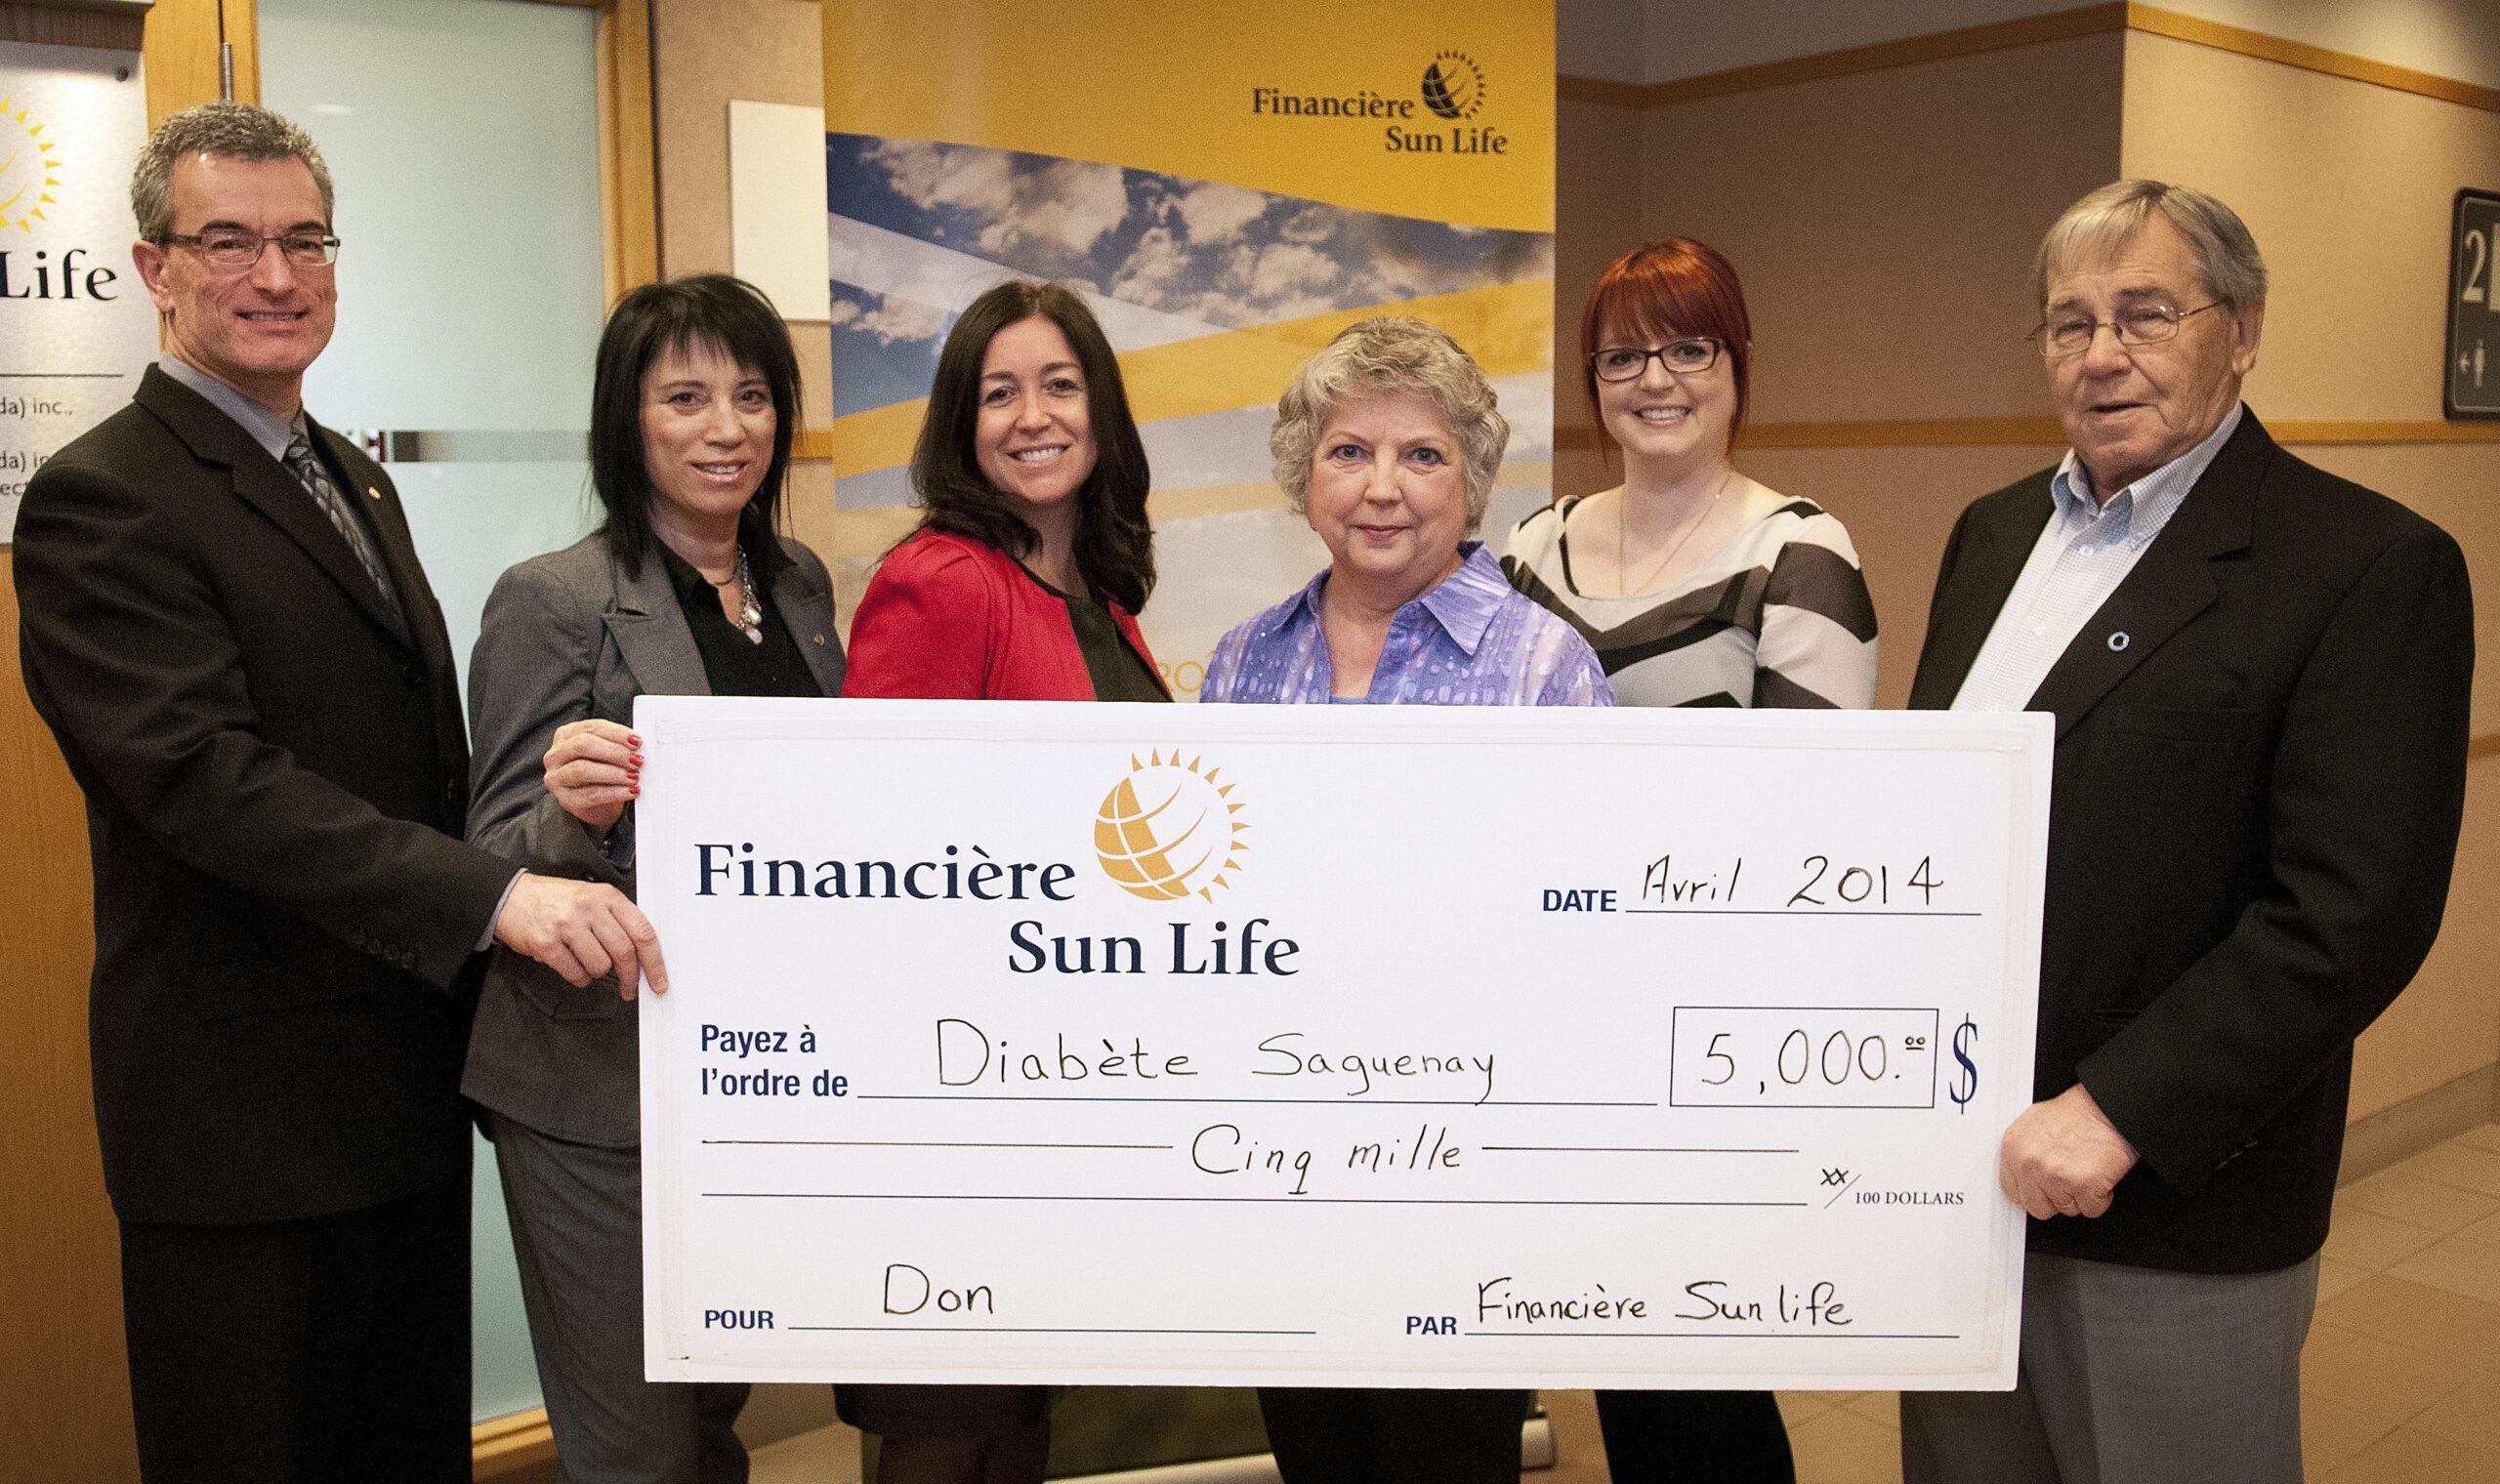 Financiere-Sunlife1-2014